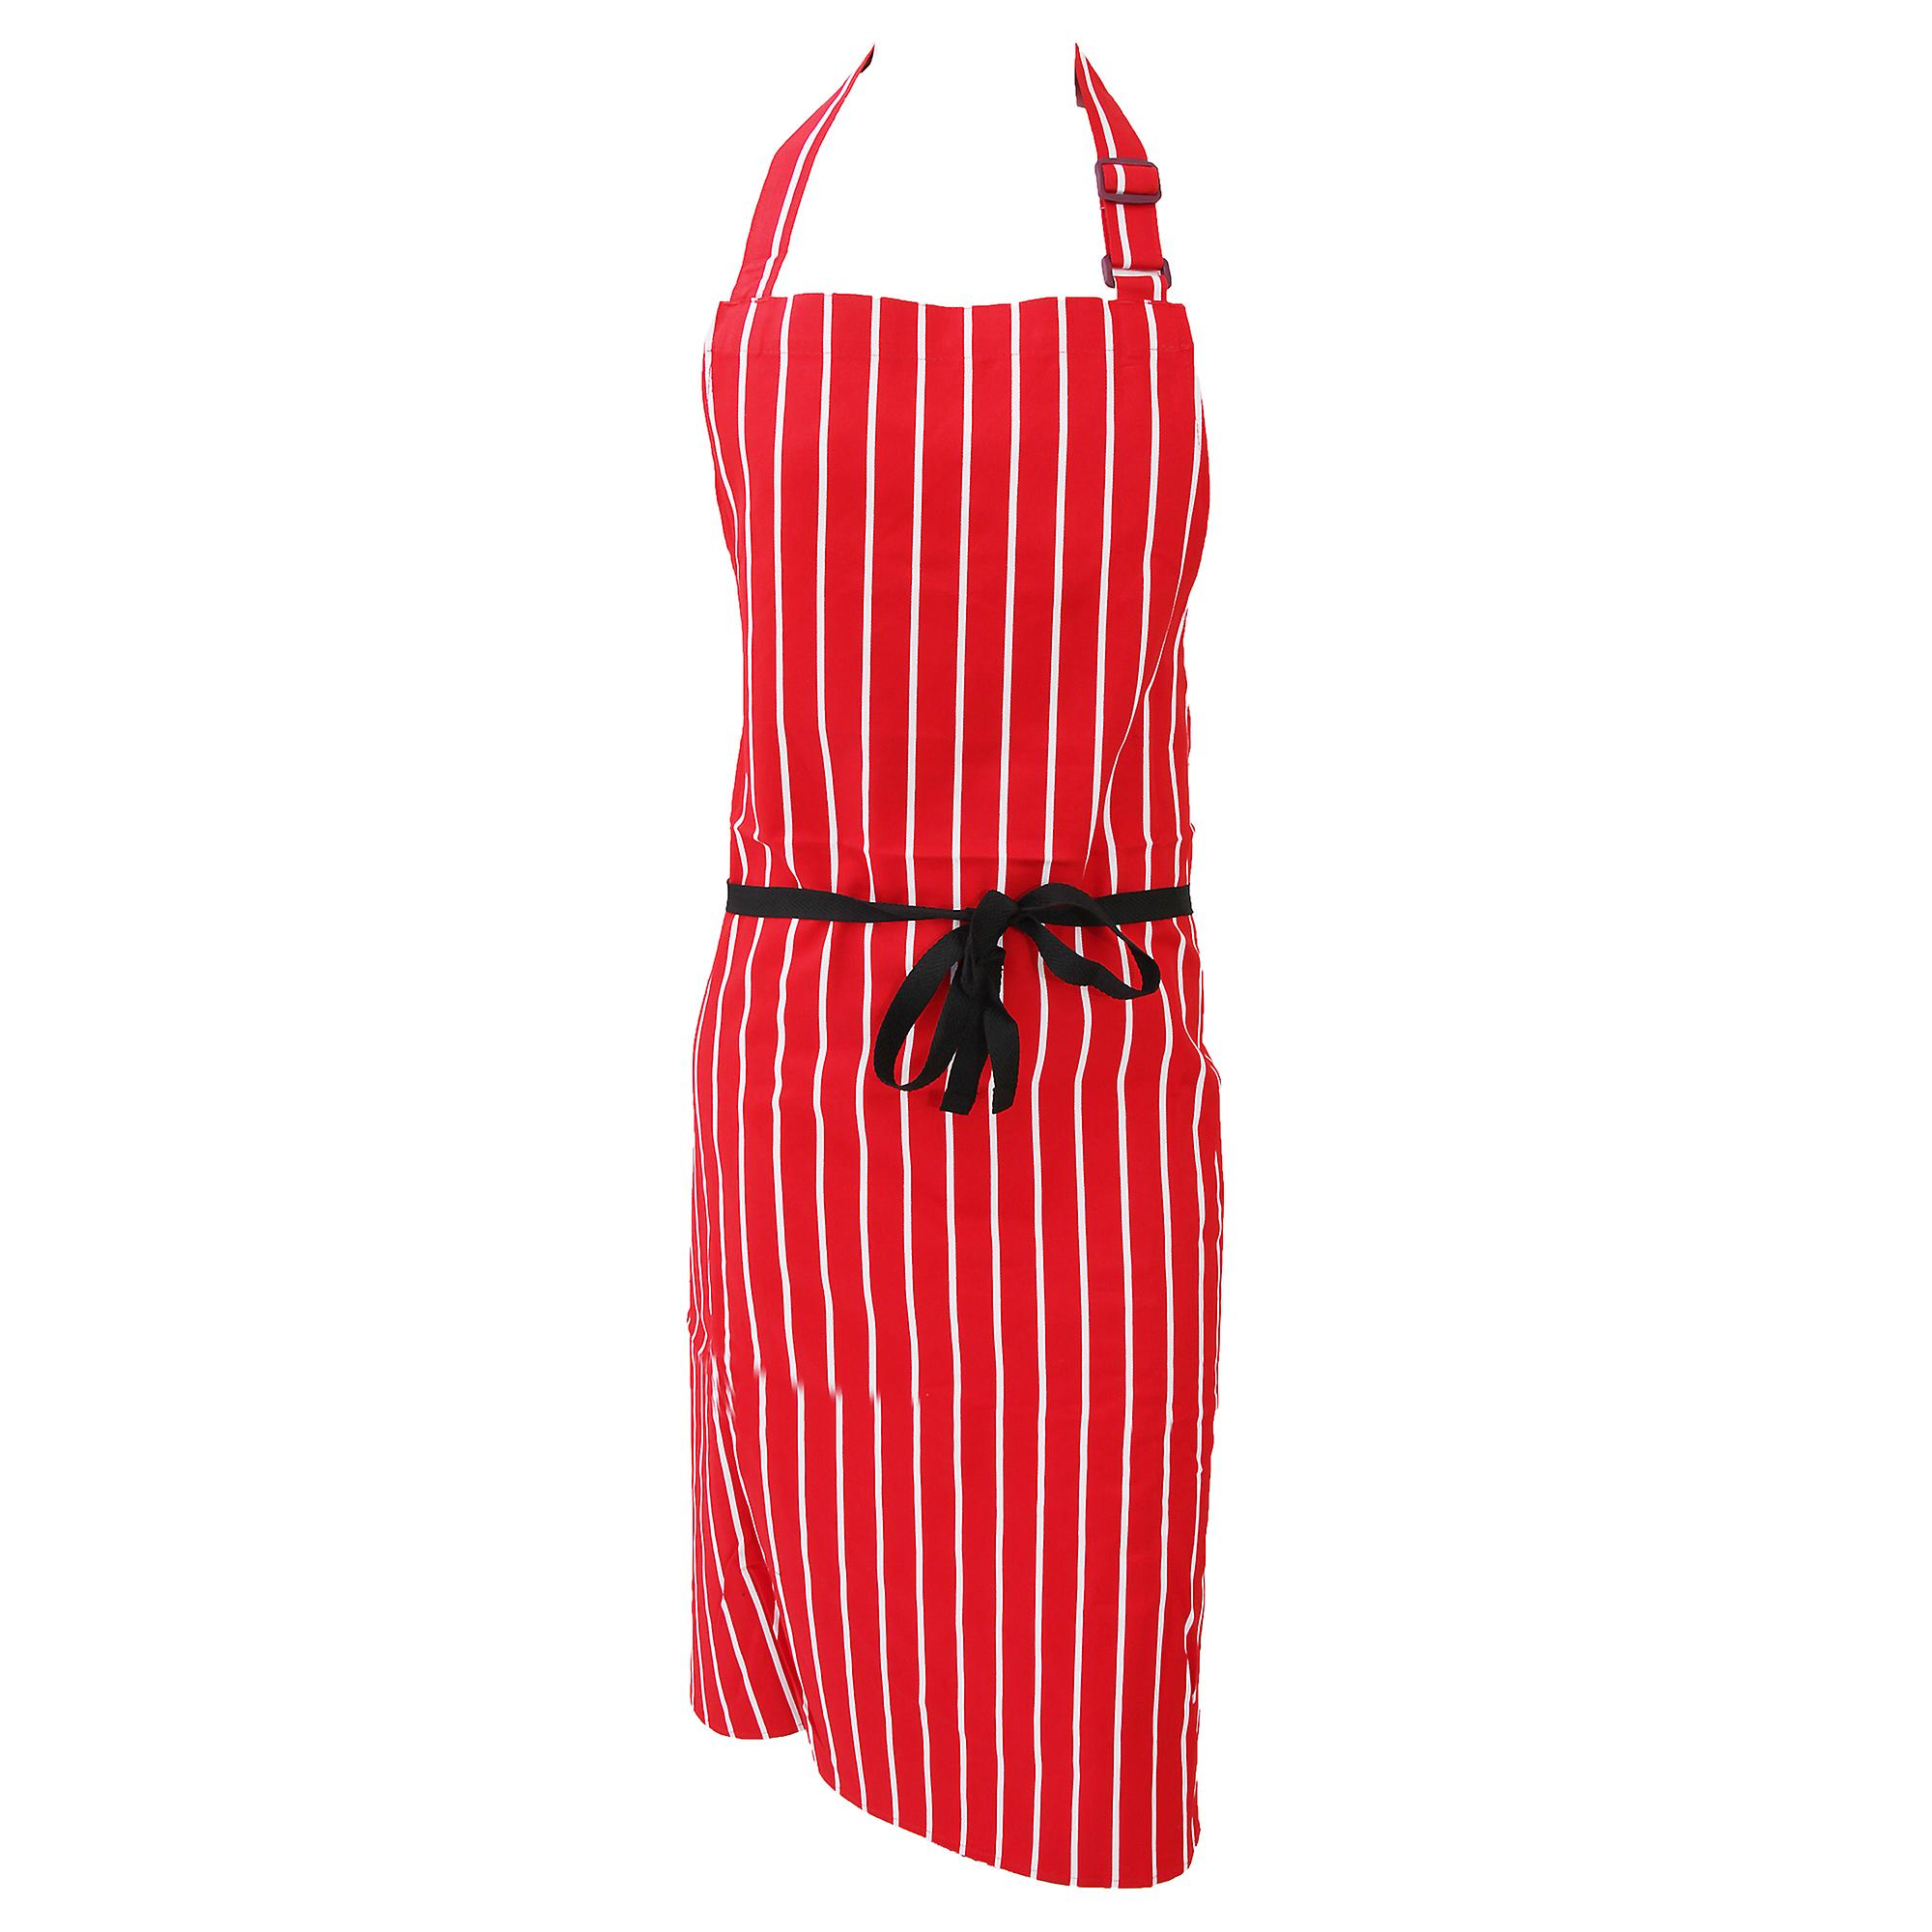 Dennys Unisex Cotton Striped Workwear Butchers Apron